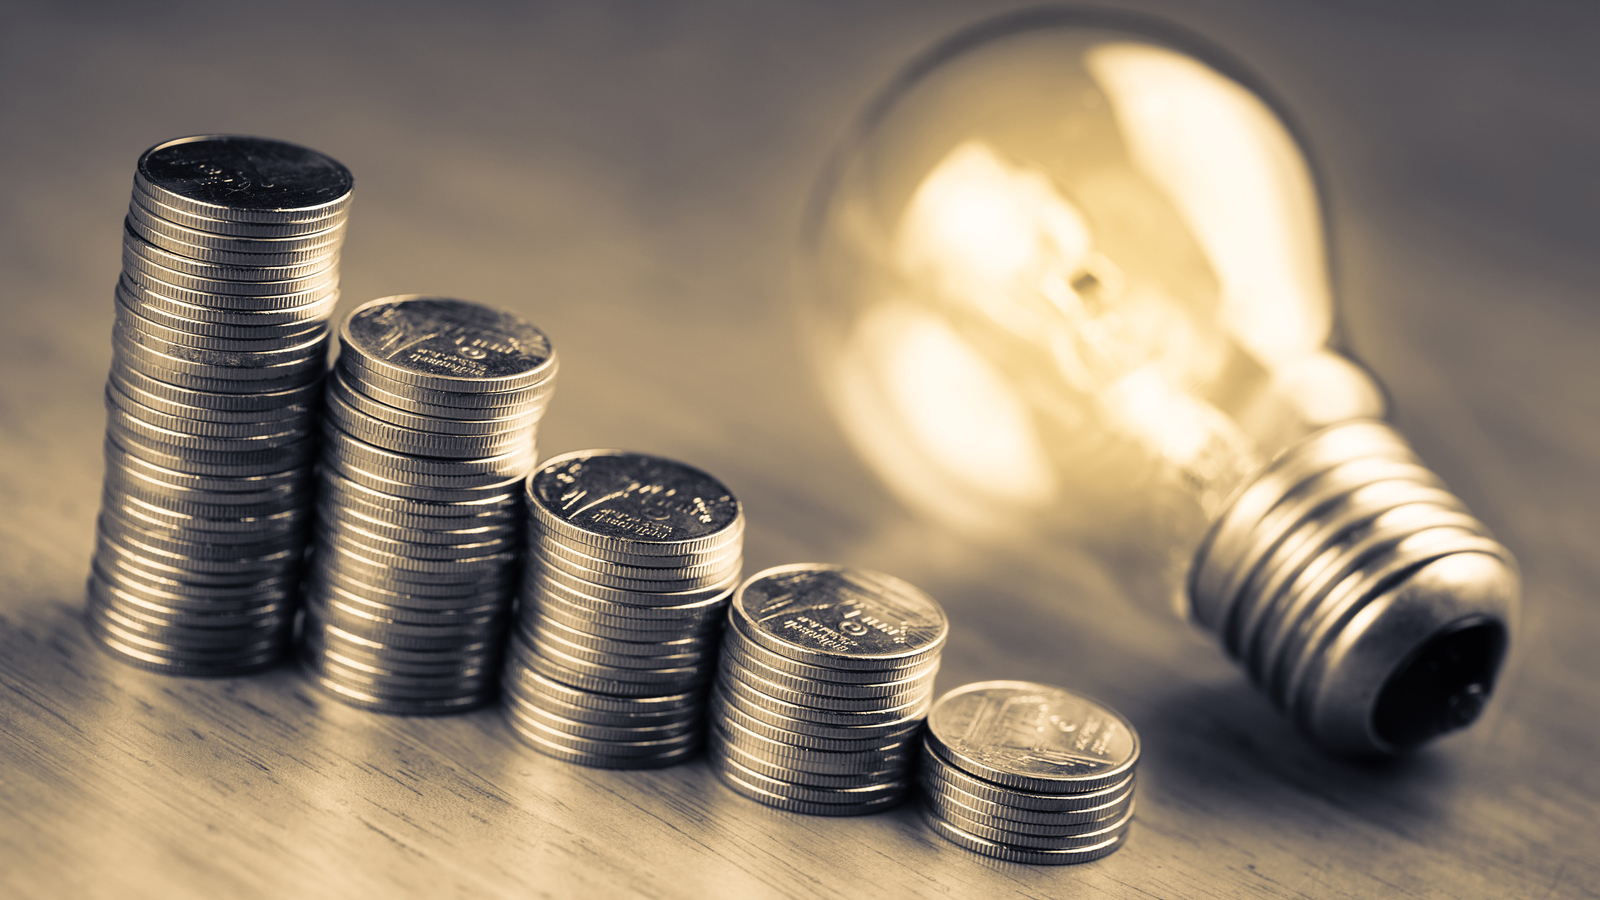 5 trucos para ahorrar energ a - Trucos ahorrar luz ...